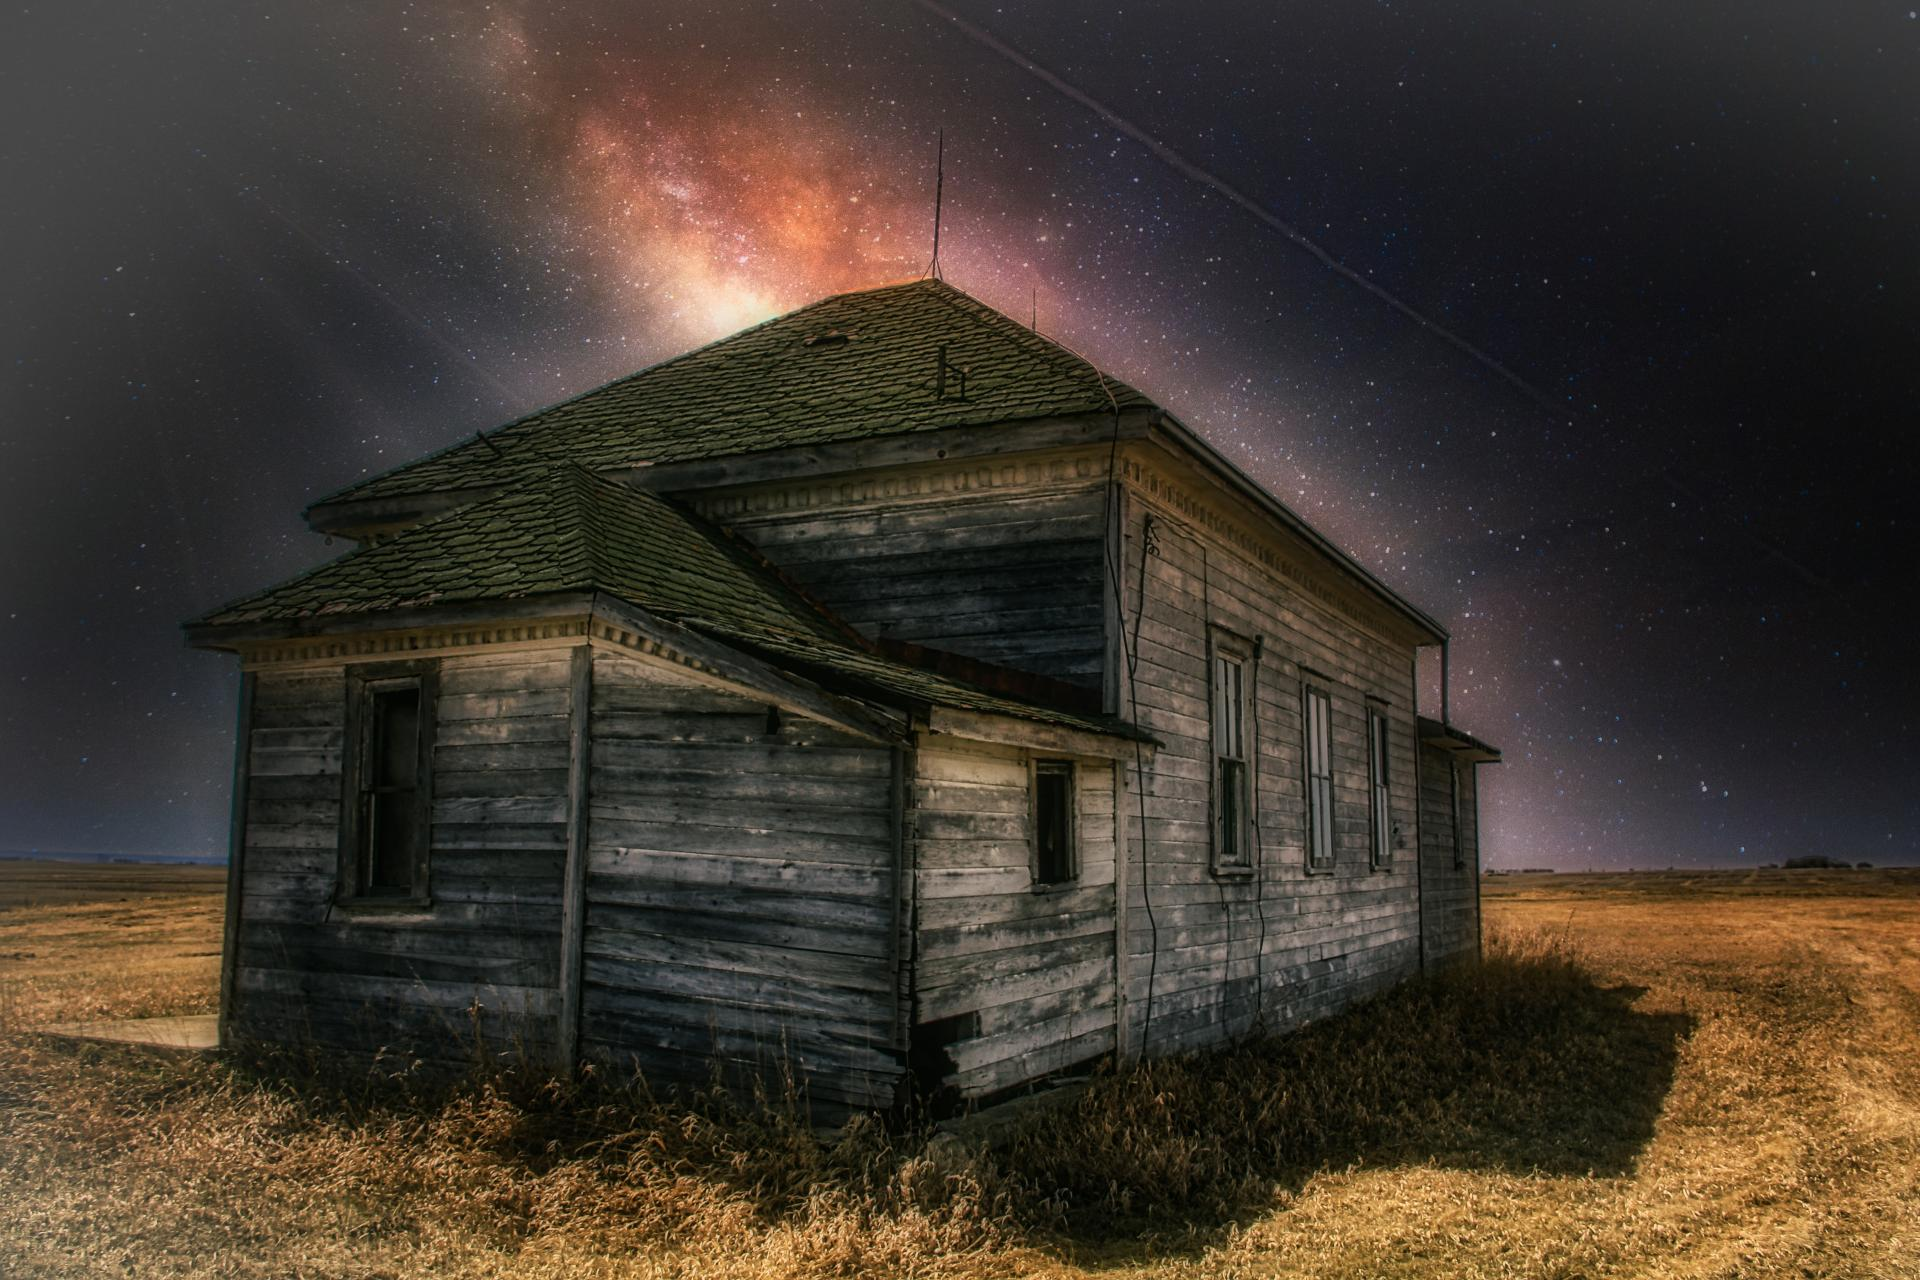 Schoolhouse stars